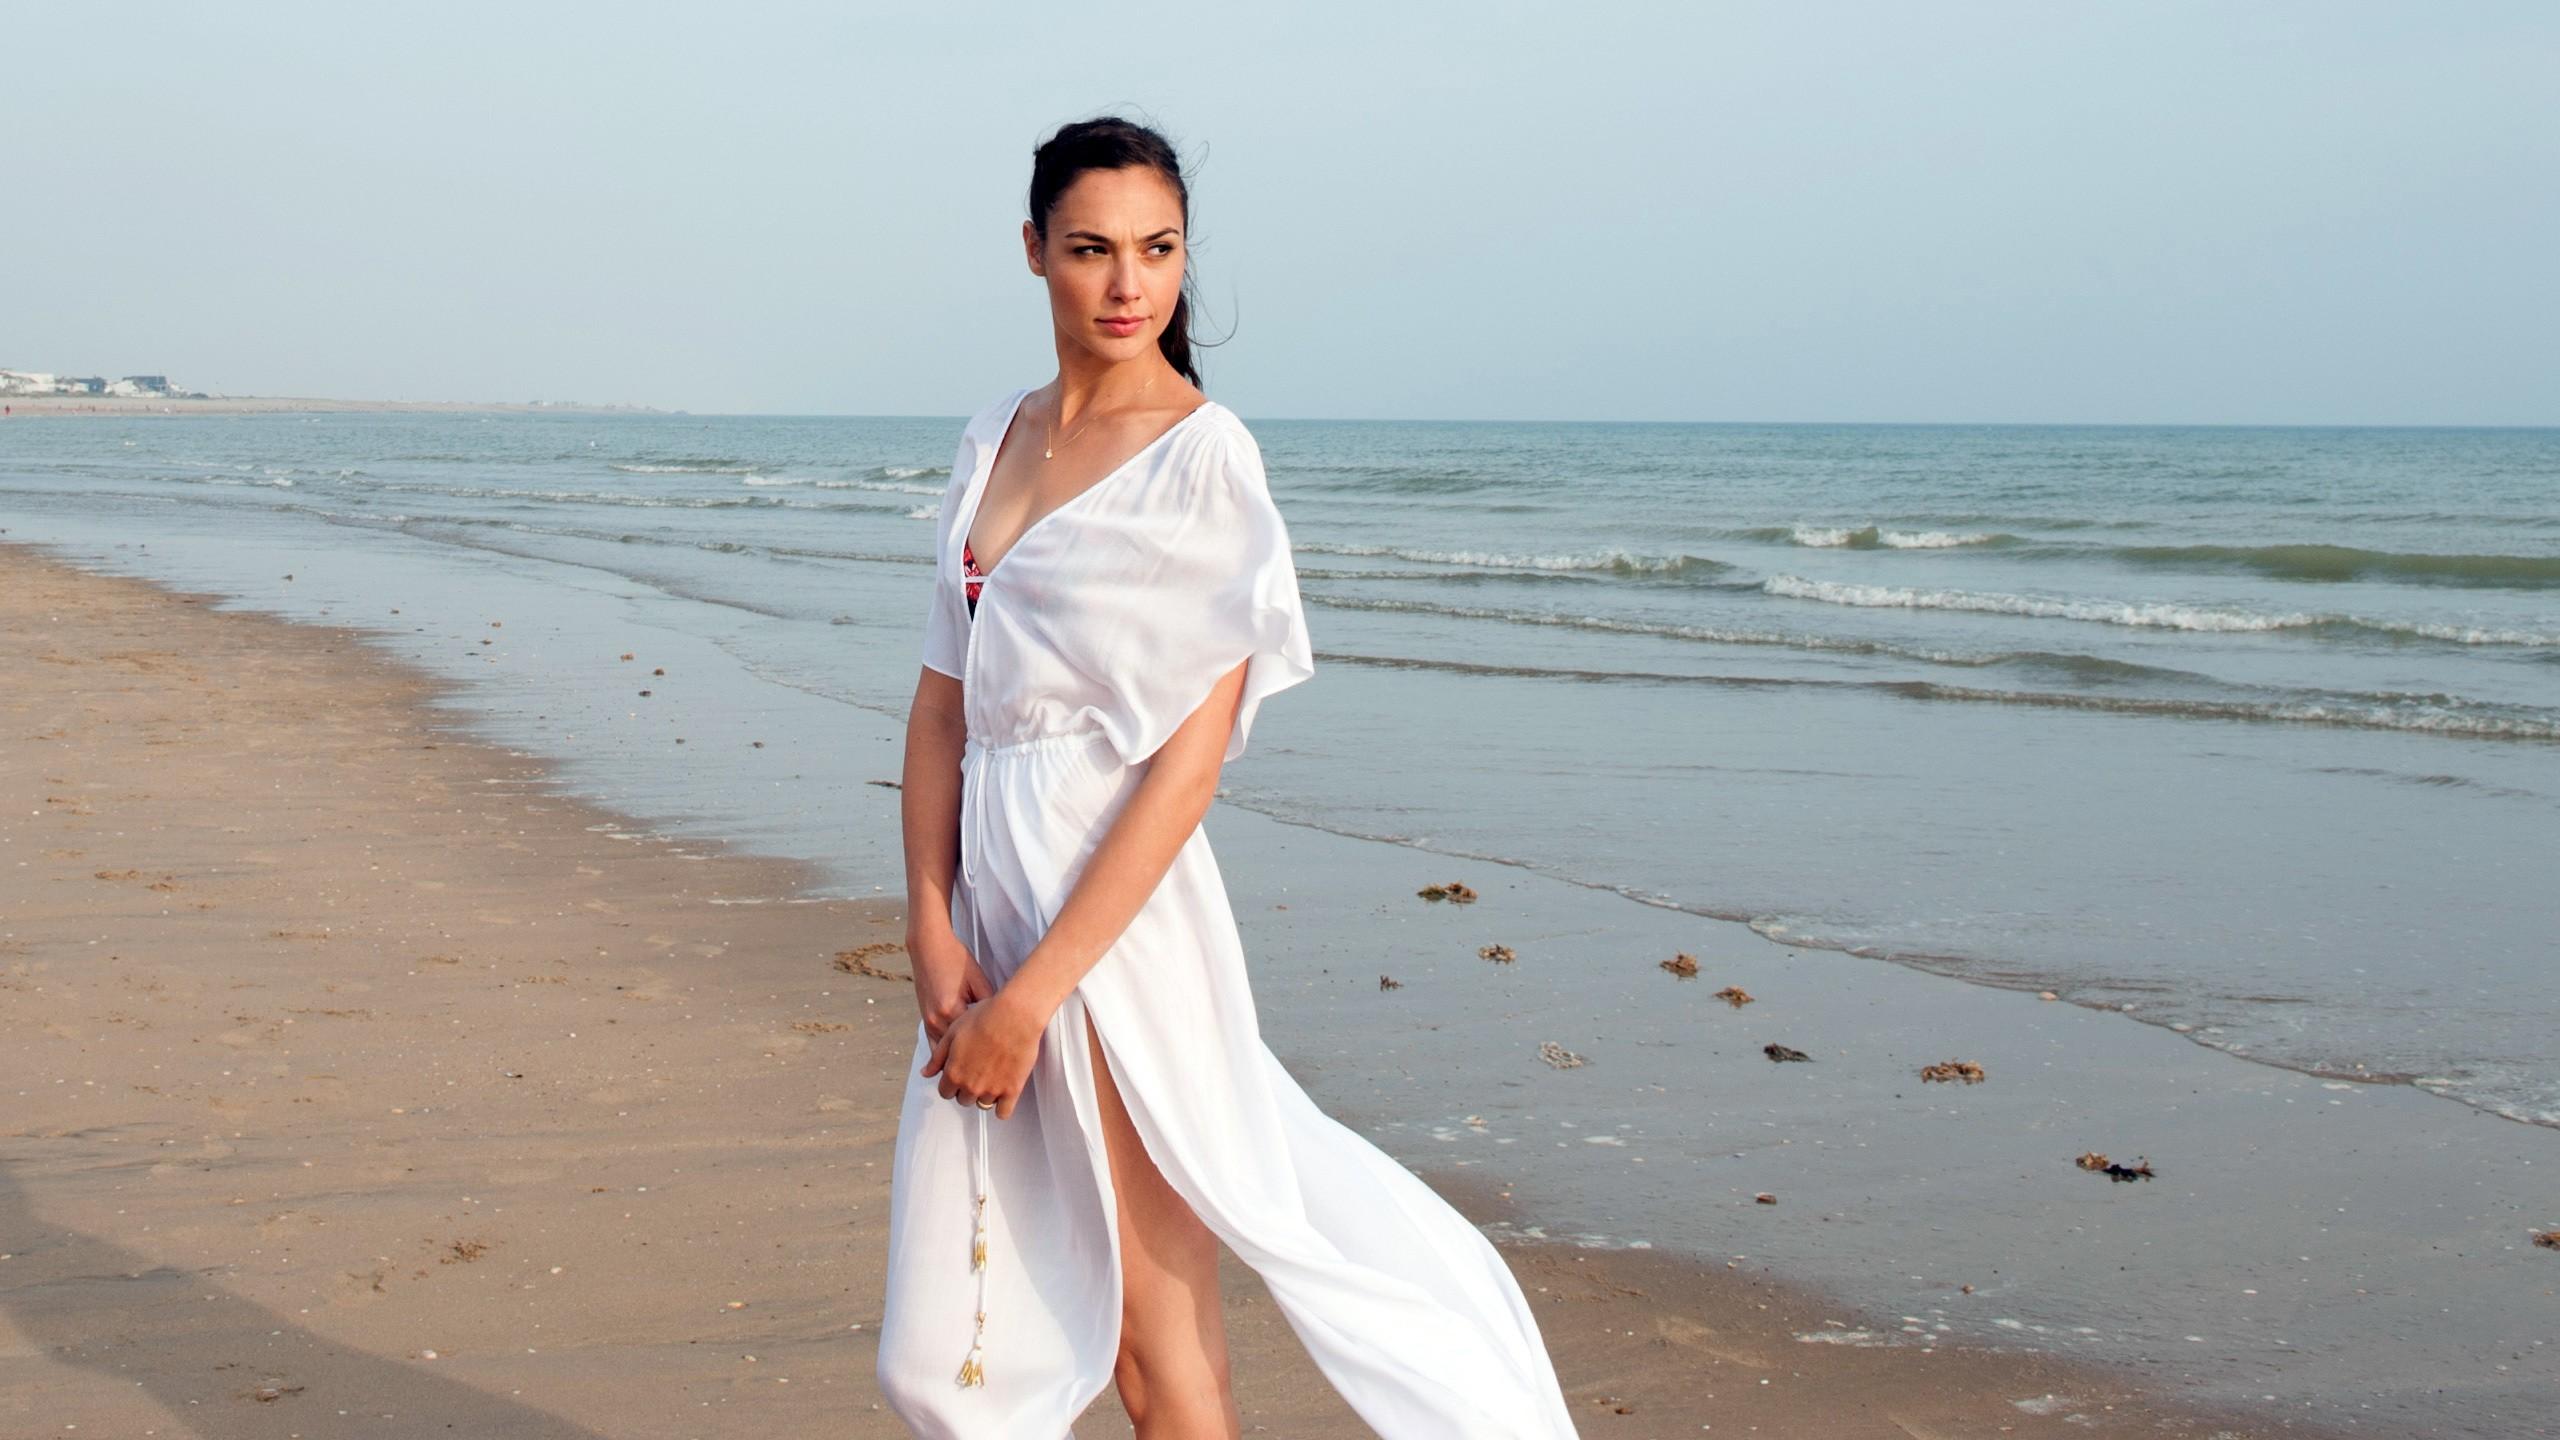 Fondos de pantalla : blanco, mujer, modelo, mar, pelo largo, arena ...